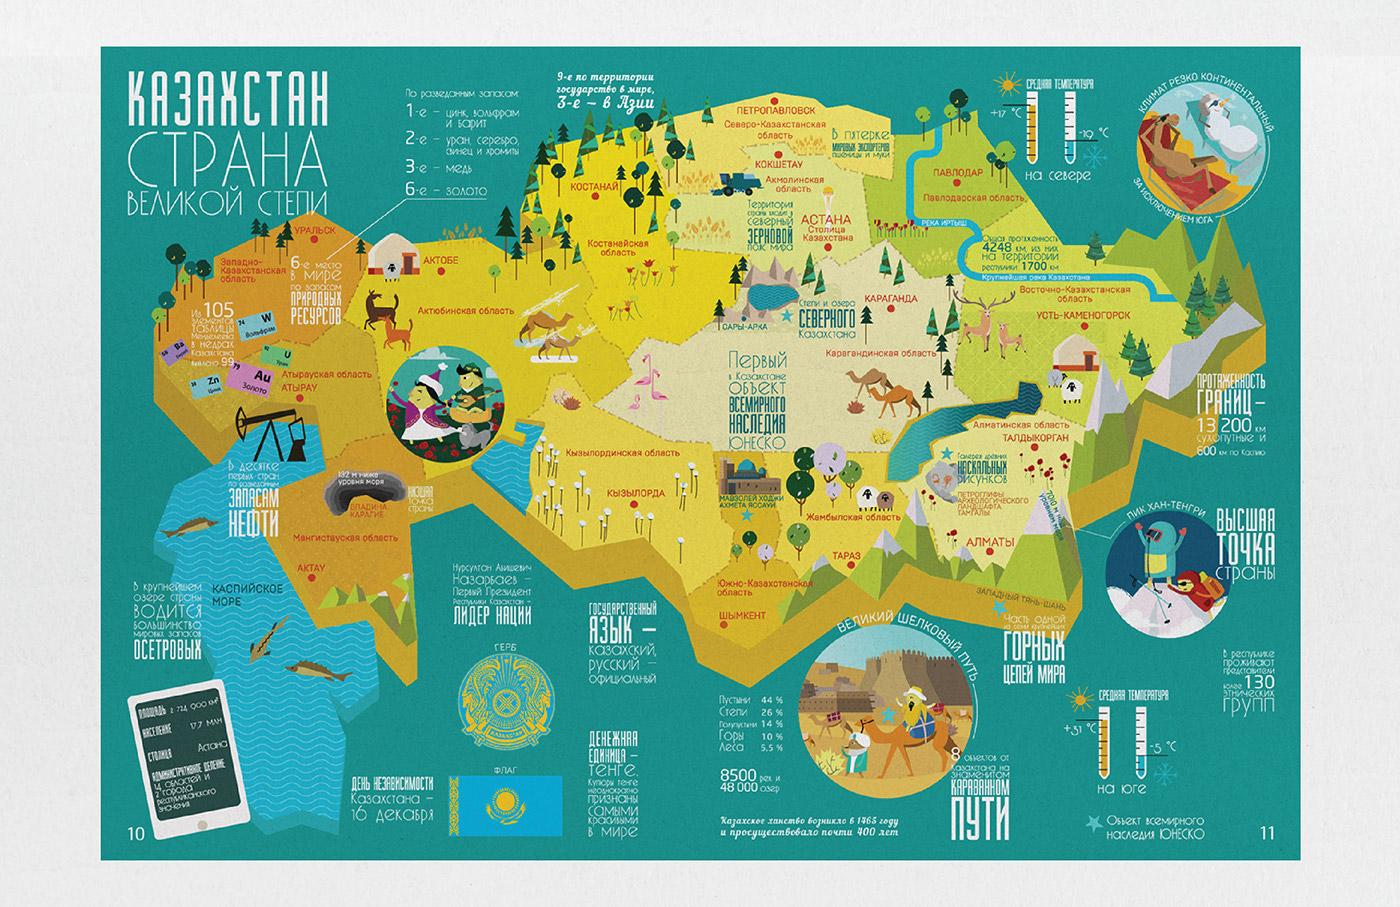 Travel Book. Kazakhstan on Behance